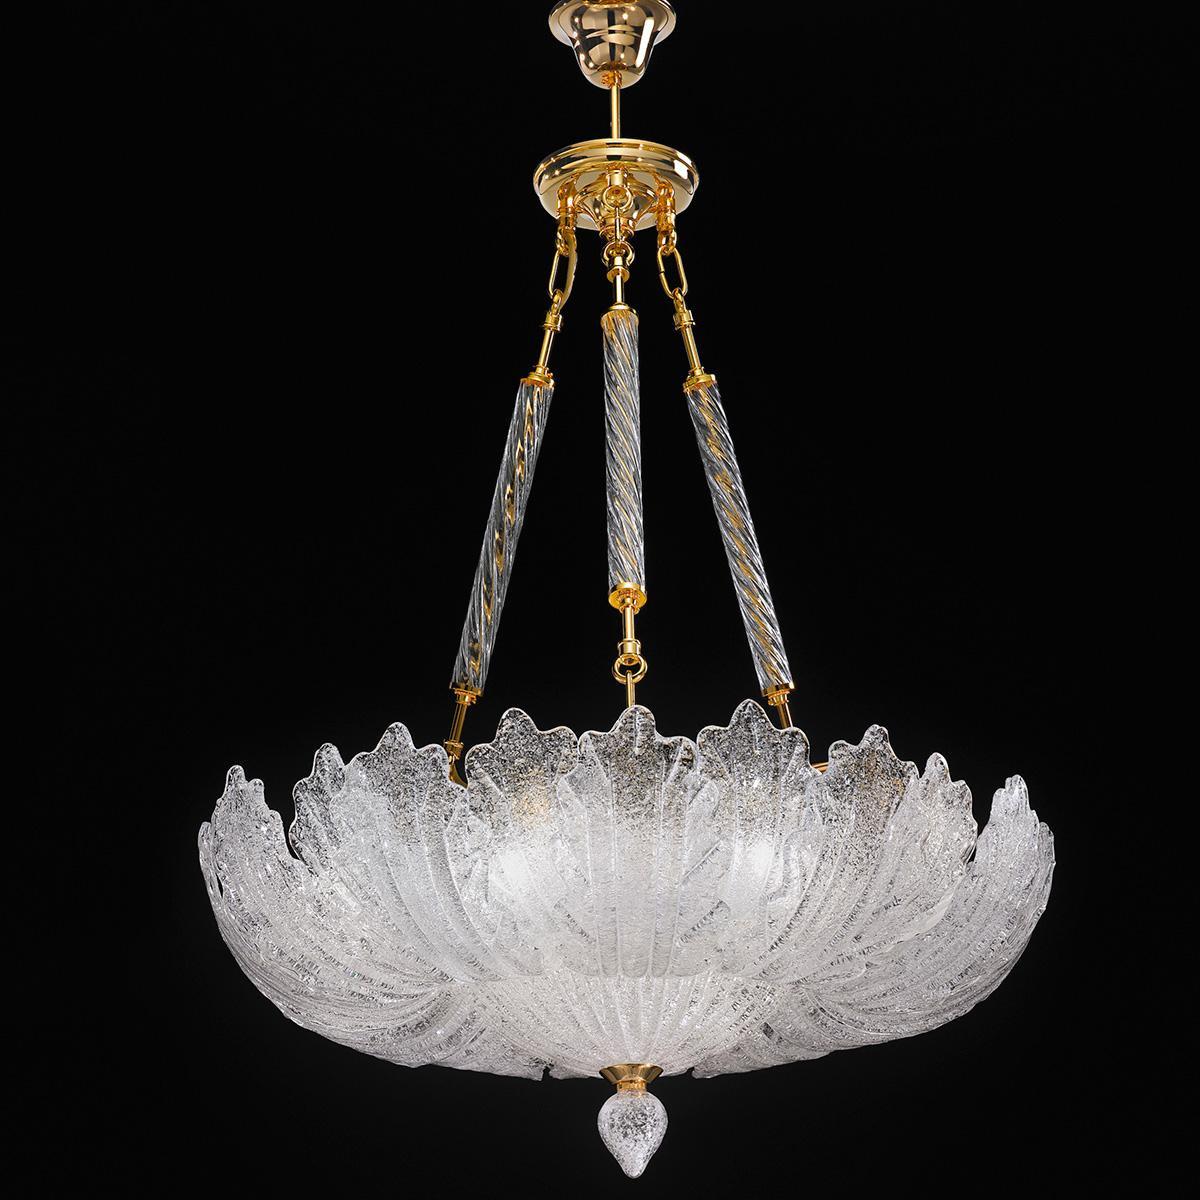 """Oliviera"" lámpara colgante en cristal de Murano - 10 luces - transparente"